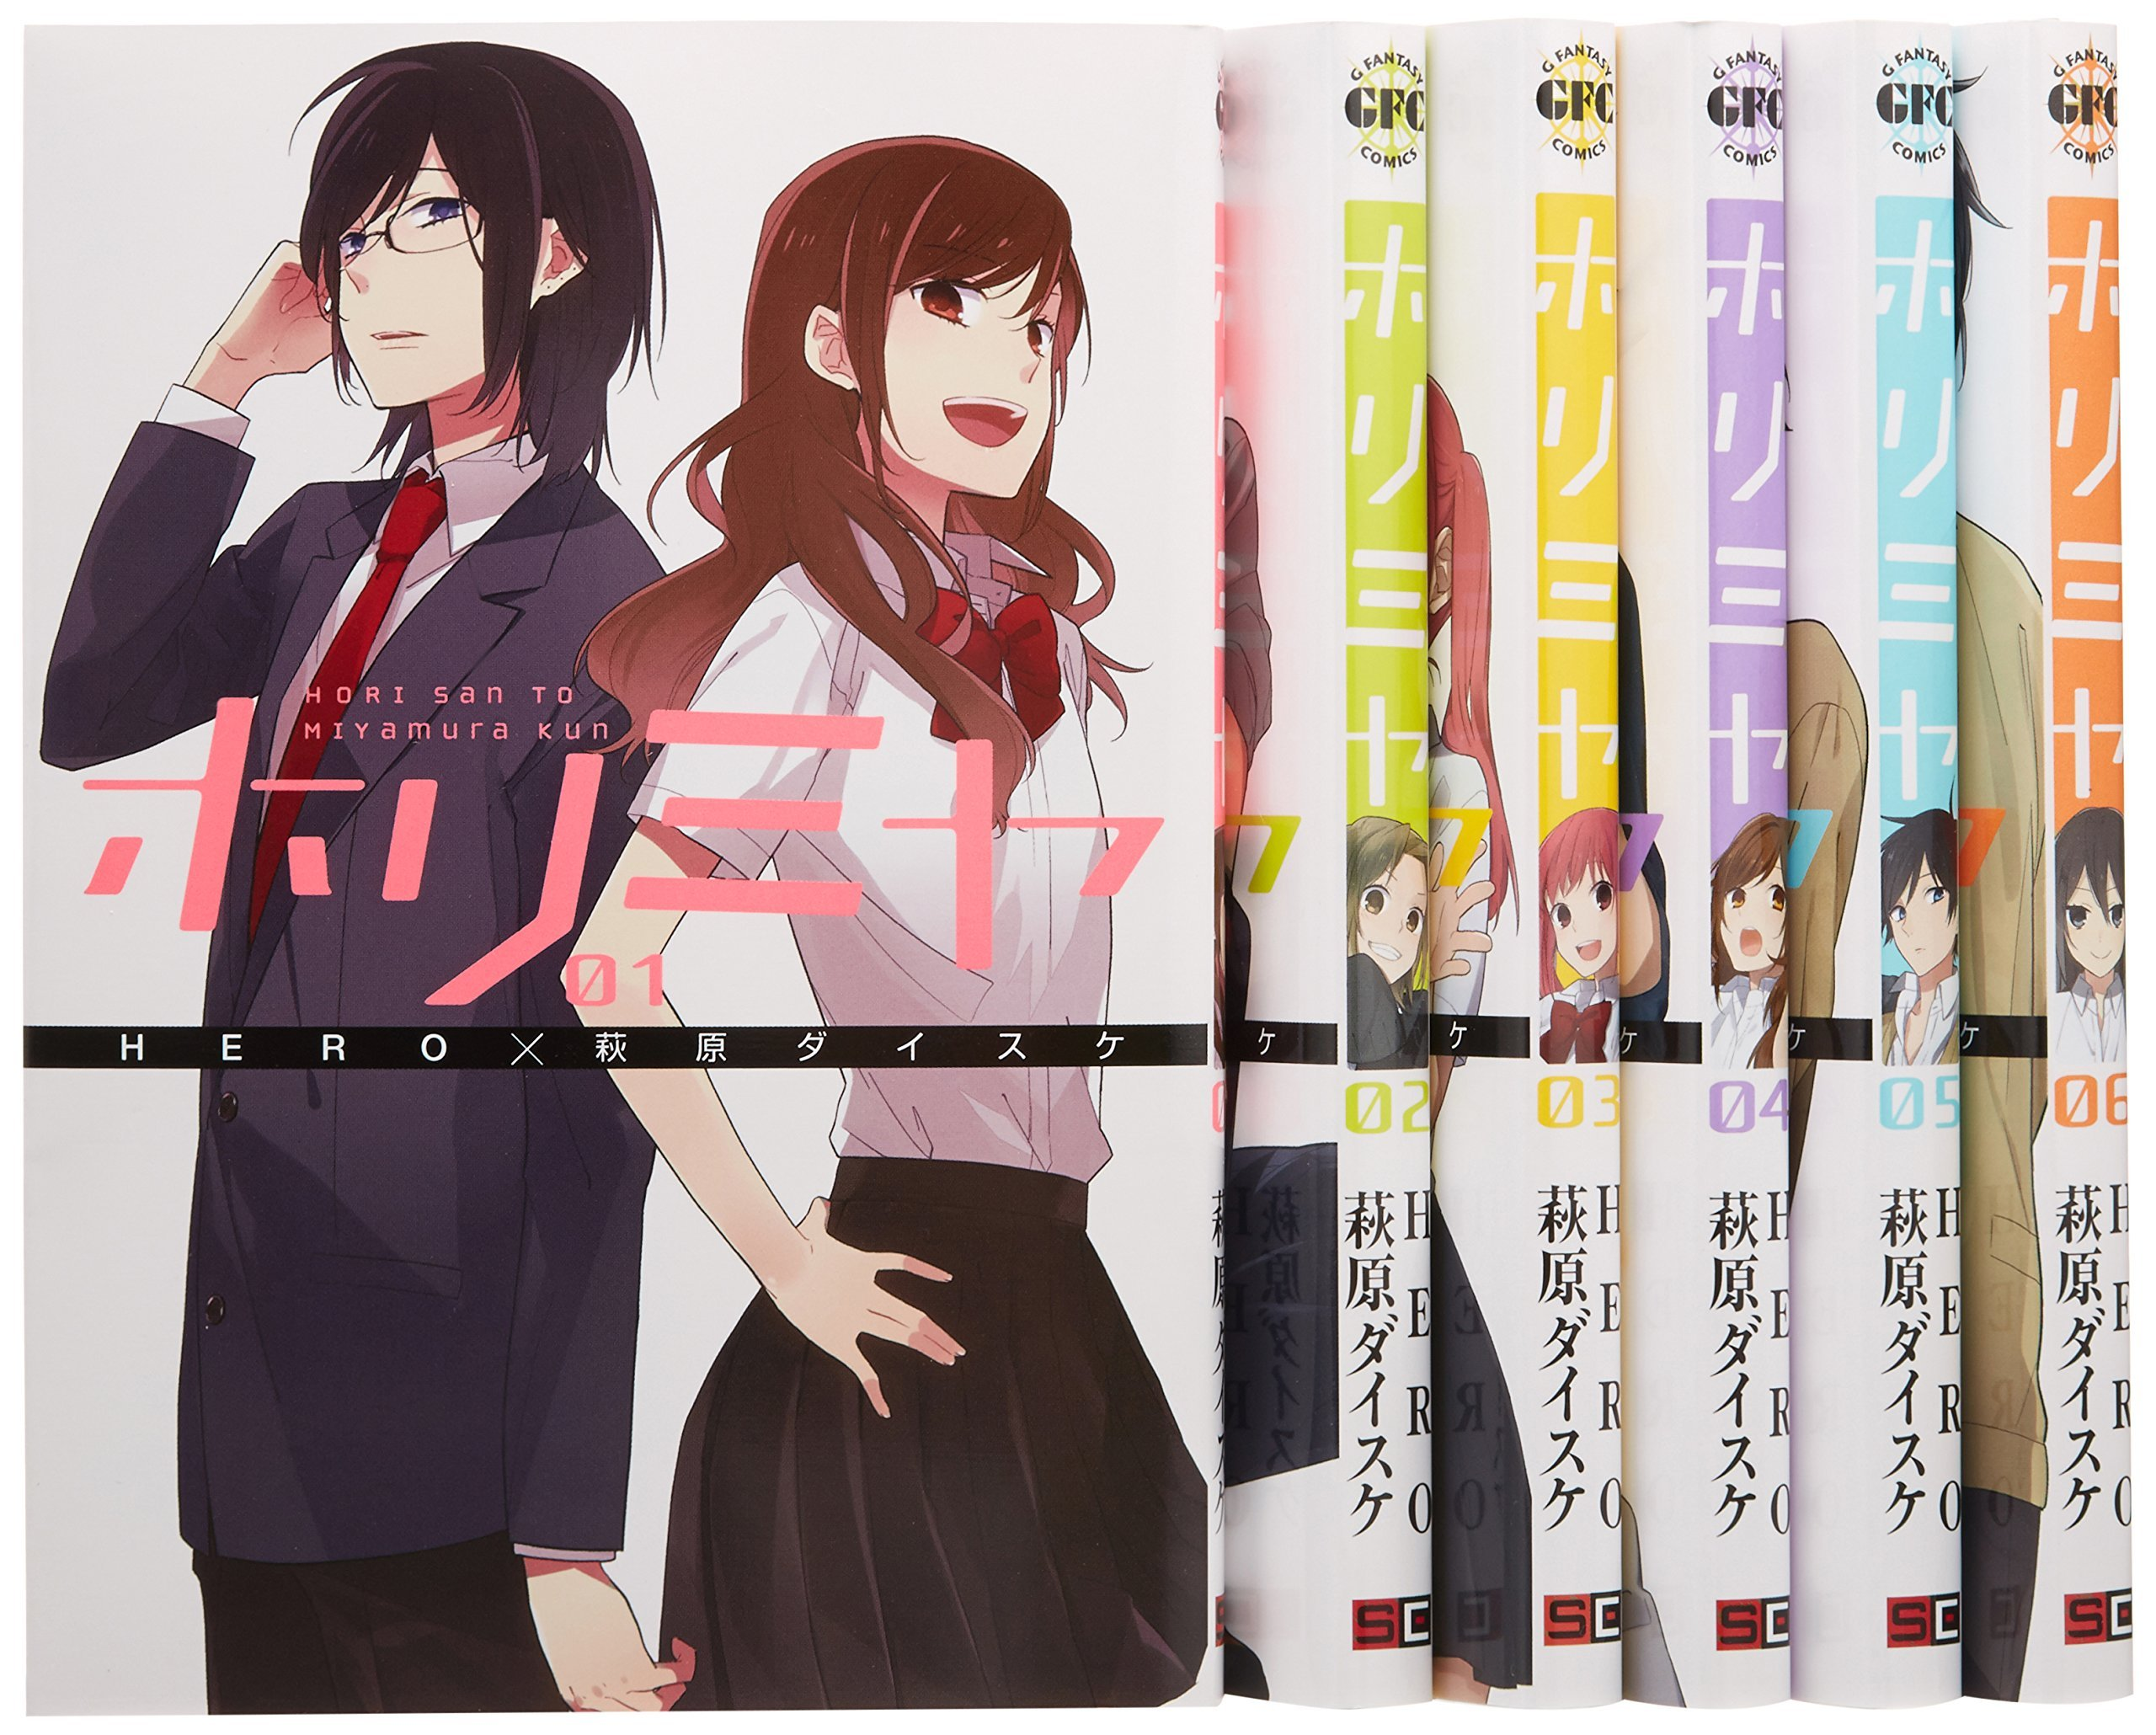 horimiya 6  Horimiya 1-6 volume set (G Fantasy Comics) Japanese Edition: Amazon ...